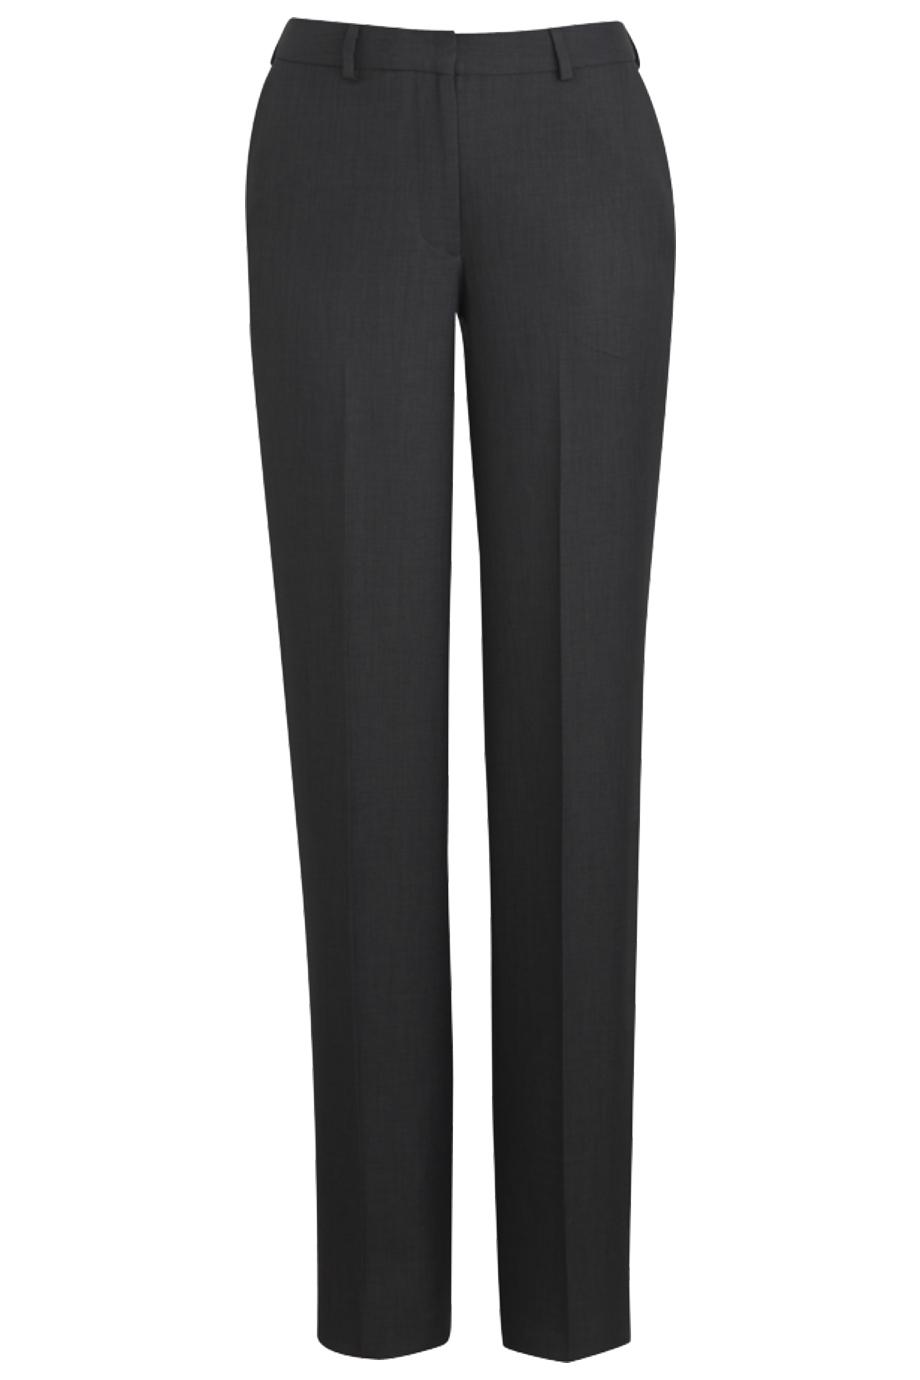 Ladies' Synergy Washable Flat Front Pant 8526